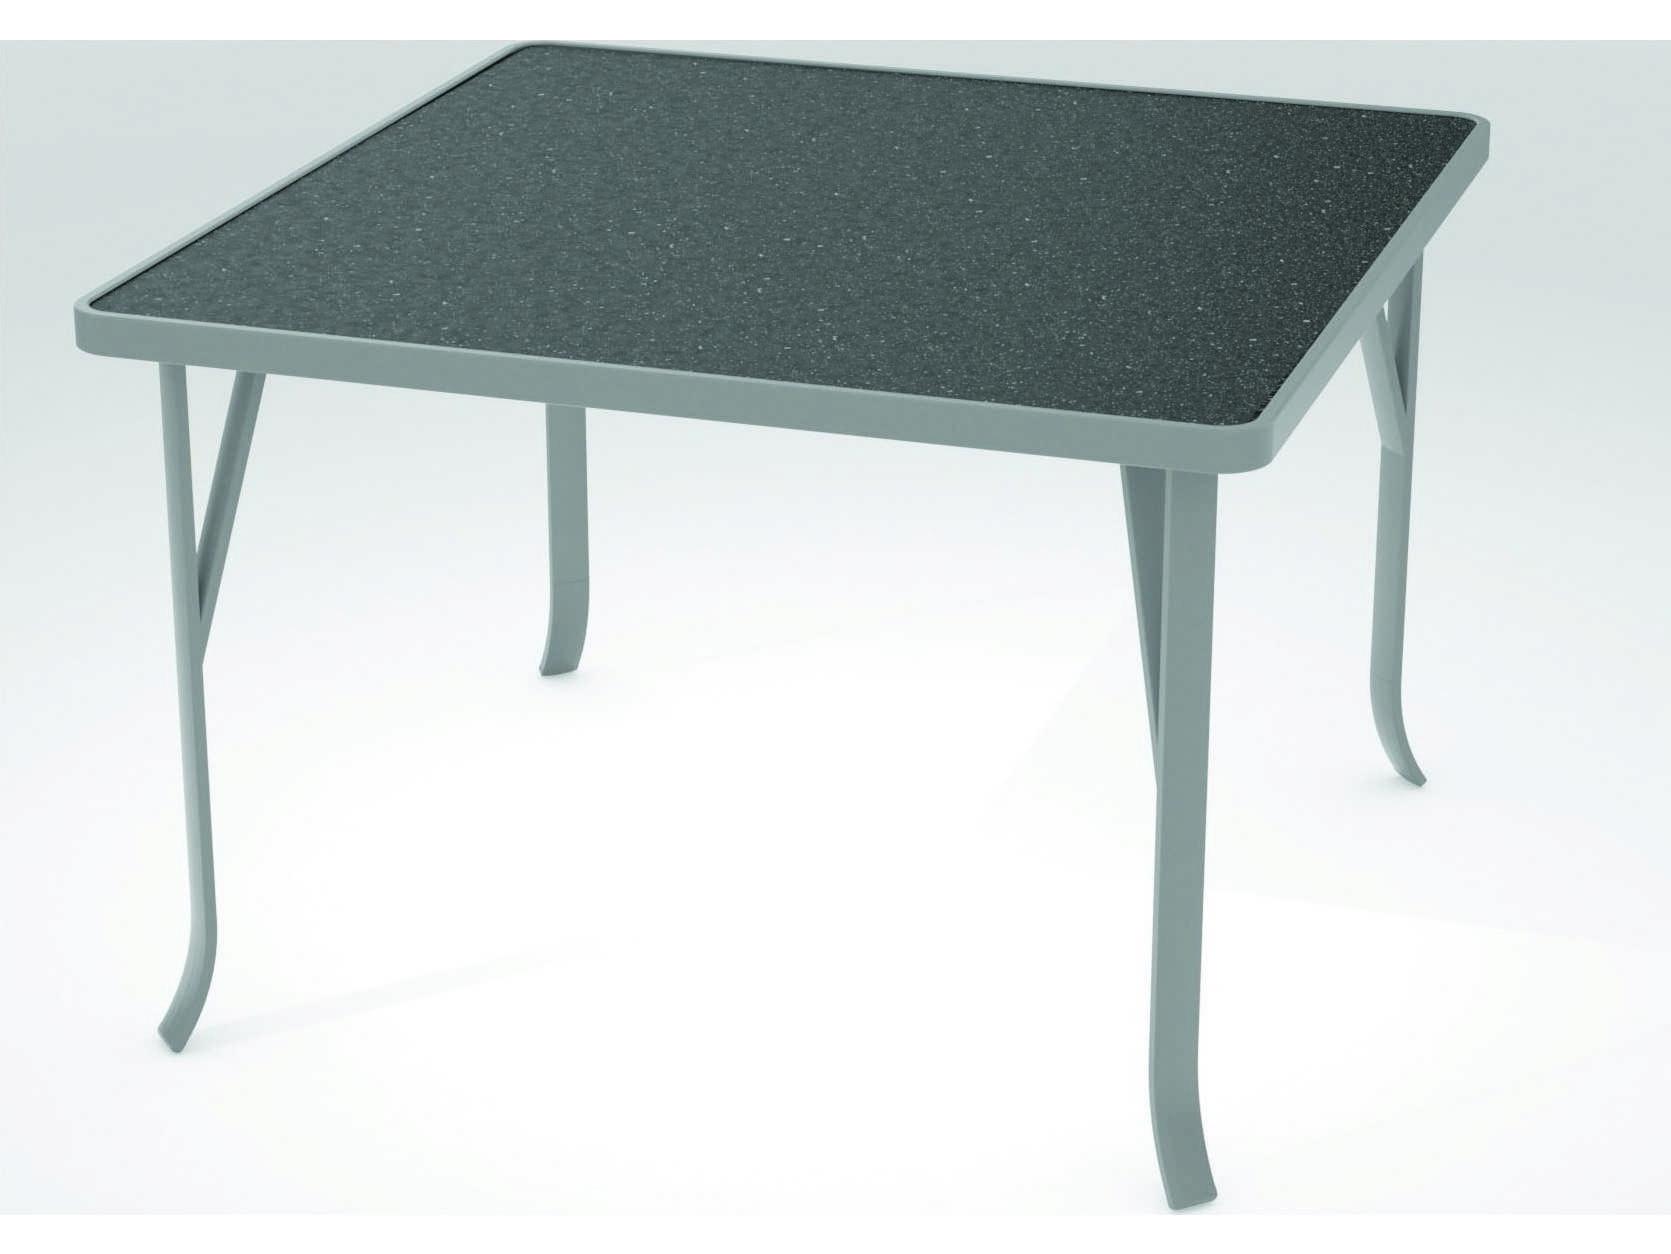 Tropitone Hpl Raduno Aluminum 42 Square Dining Table Tp4243h